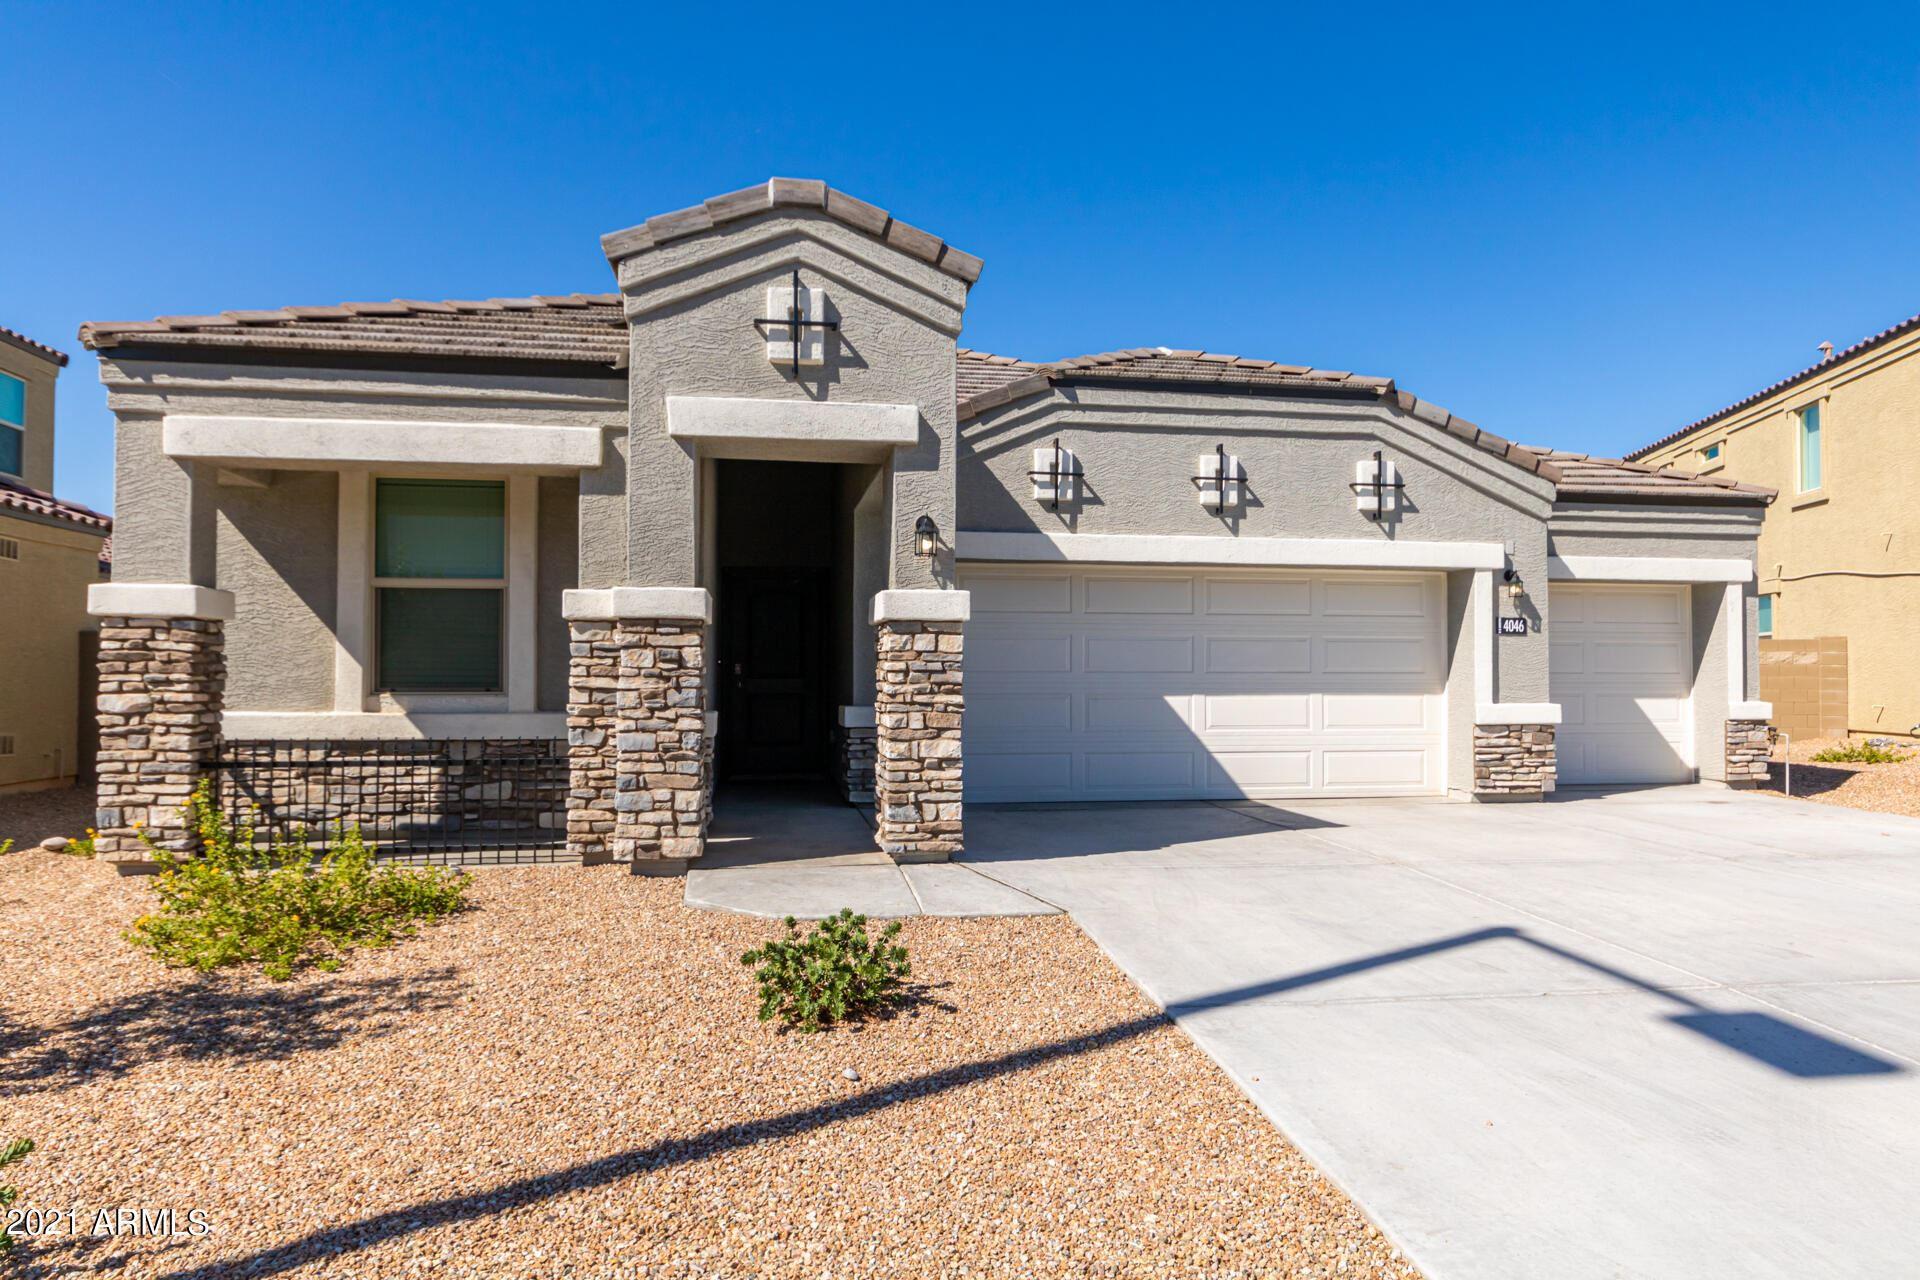 Photo of 4046 N 307TH Lane, Buckeye, AZ 85396 (MLS # 6306156)